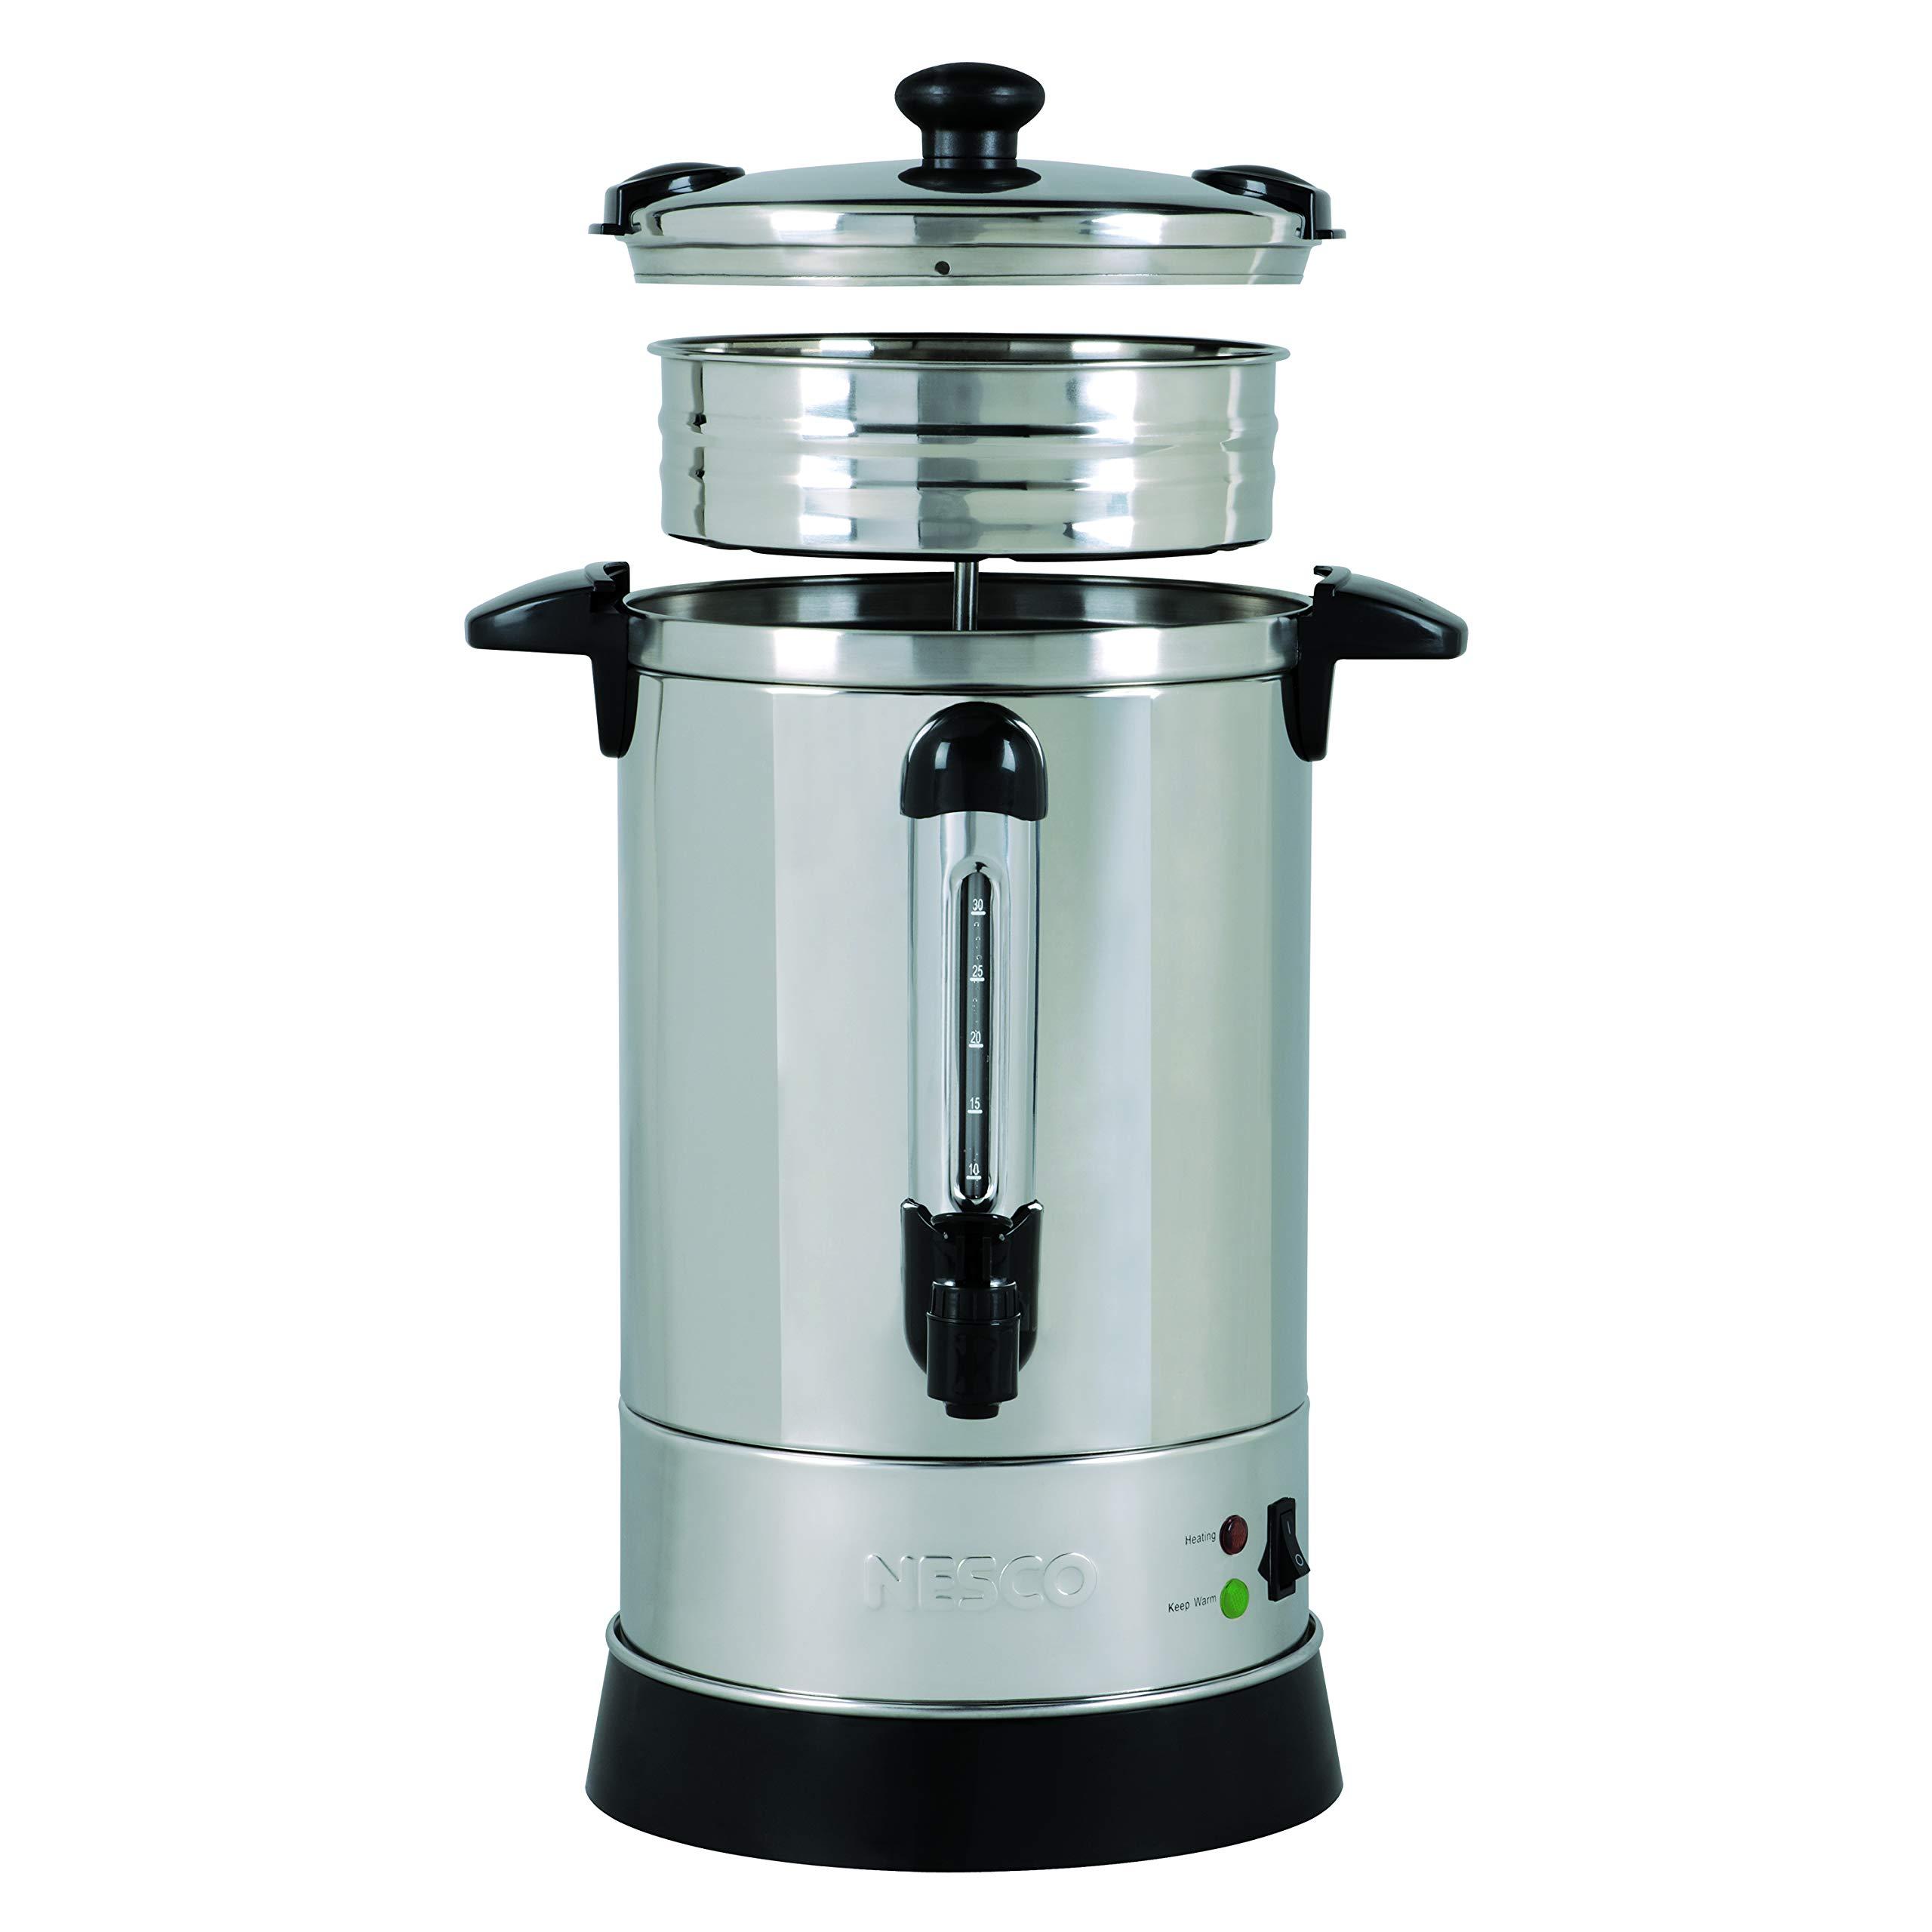 Nesco CU-30 Professional Coffee Urn Stainless Steel by Nesco (Image #2)